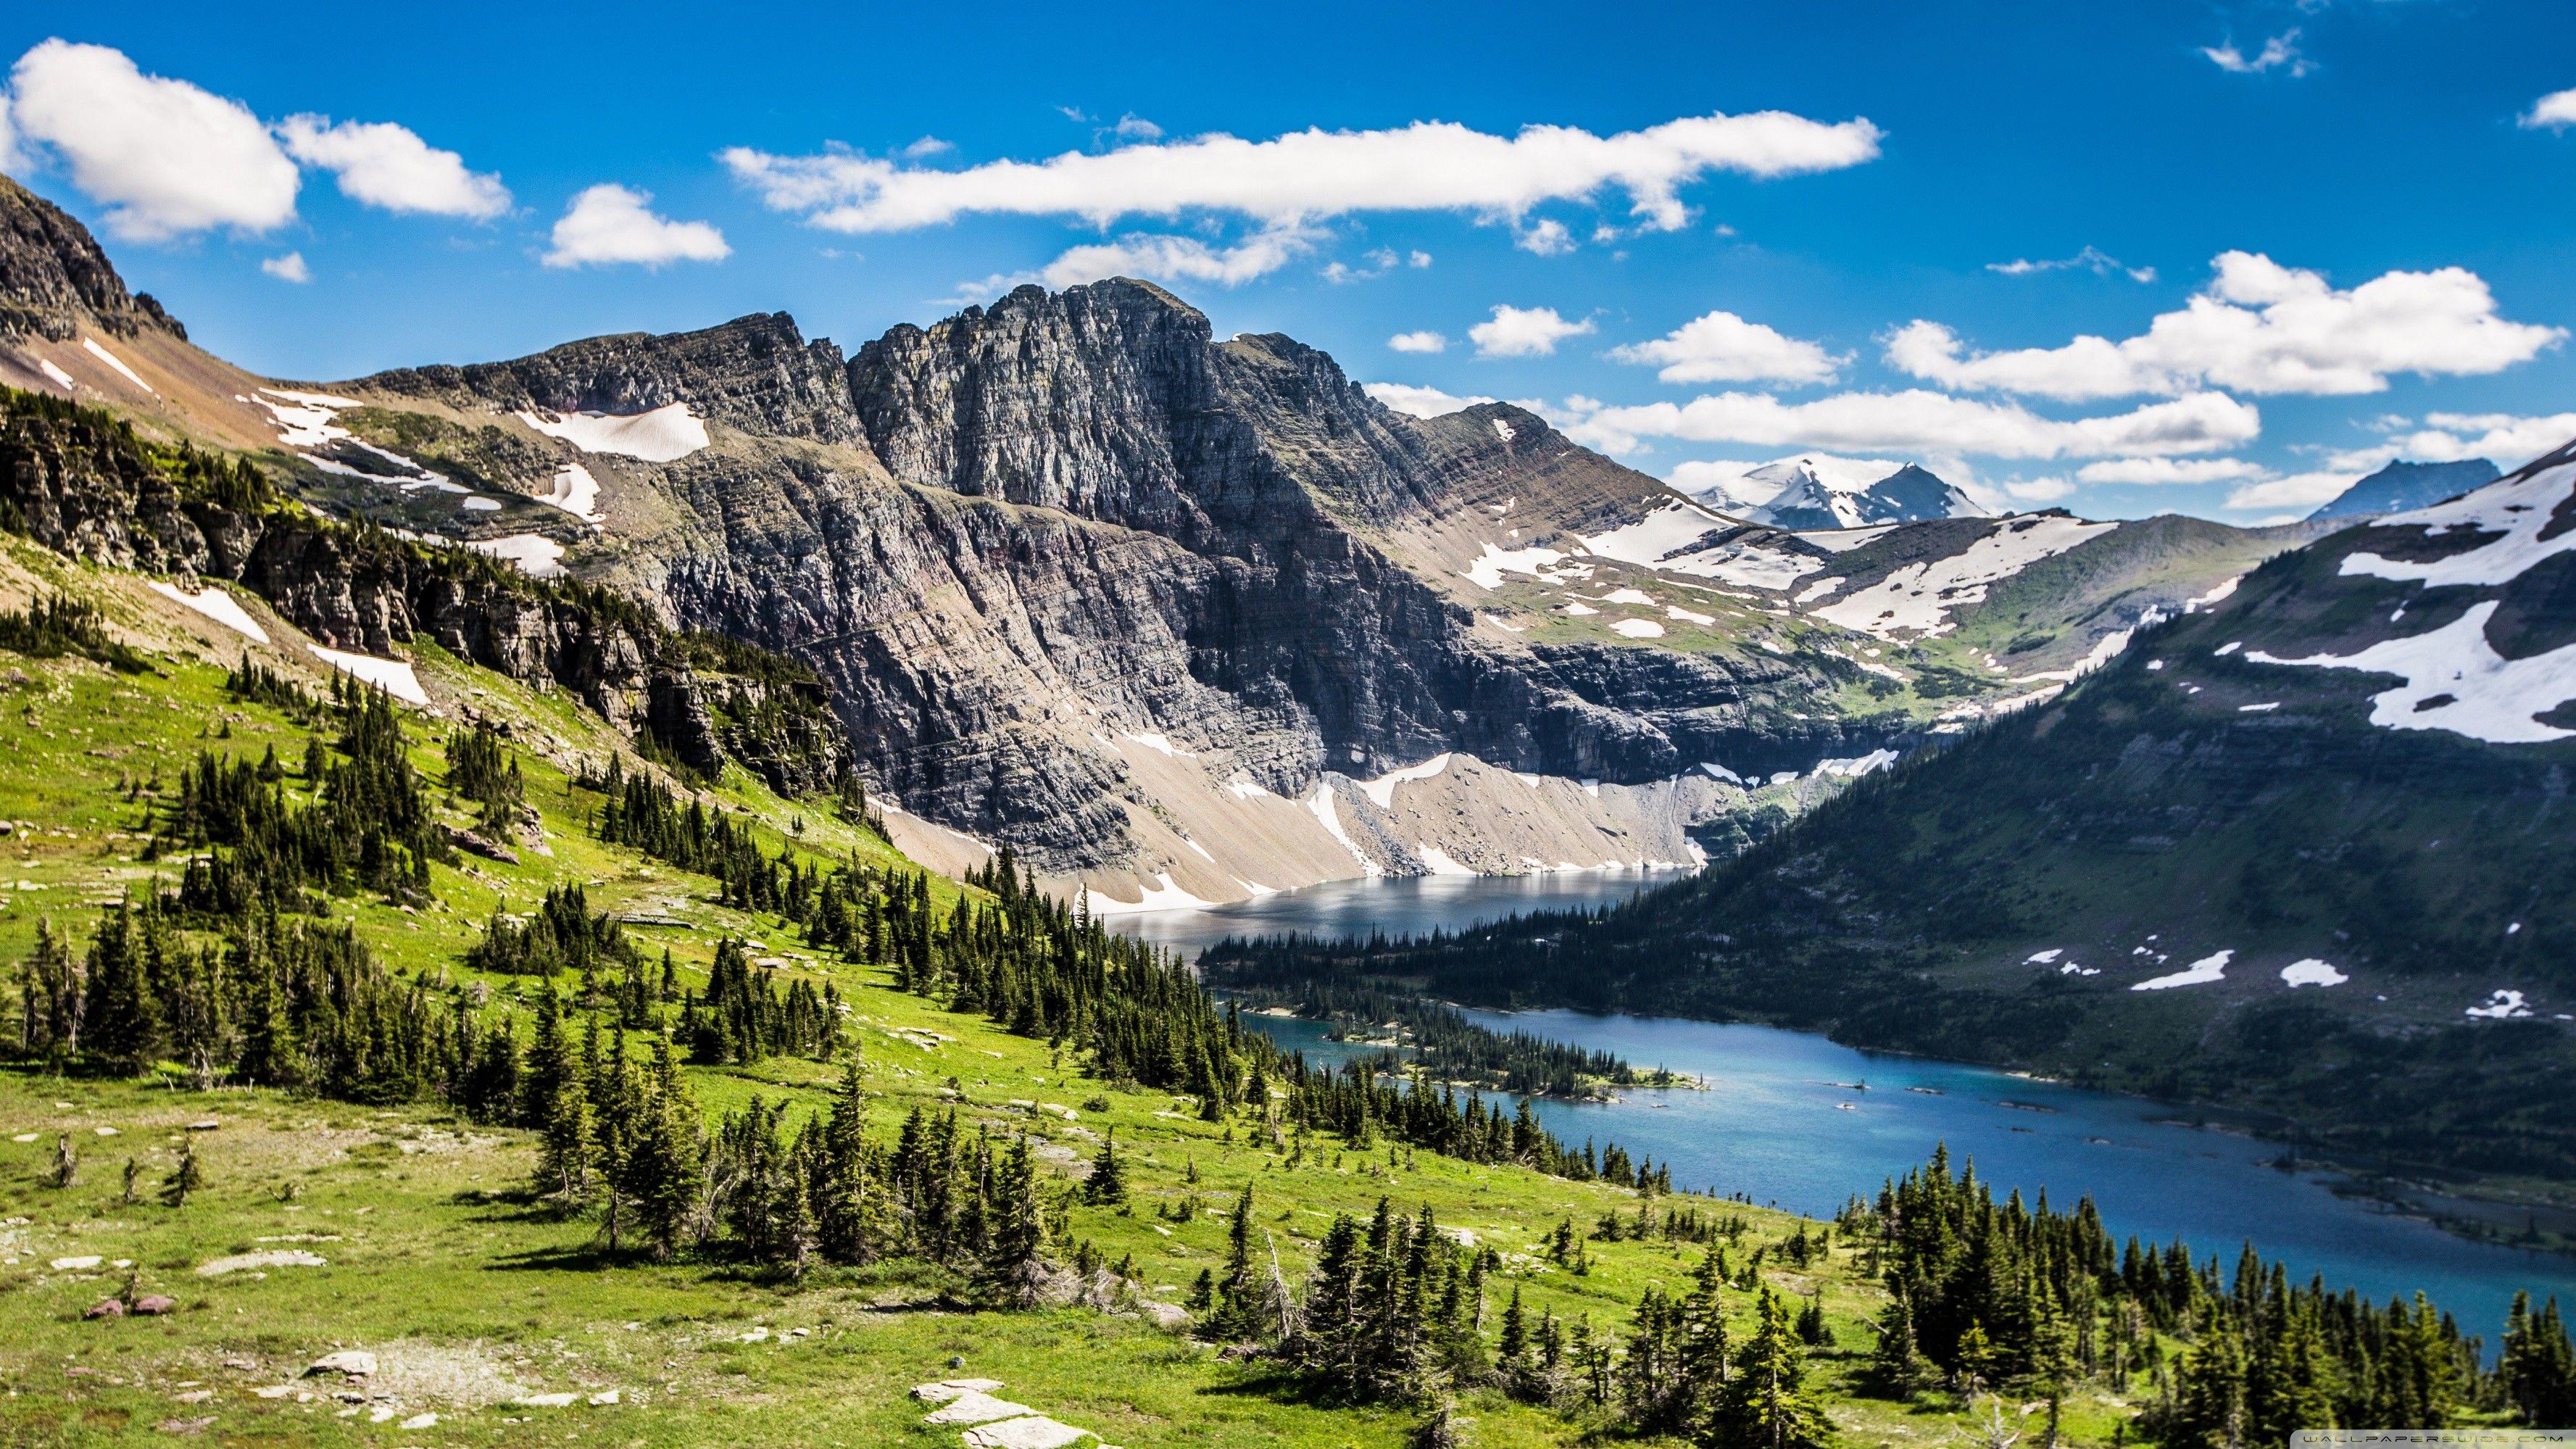 Montana Wallpapers   Top Montana Backgrounds   WallpaperAccess 3554x1999